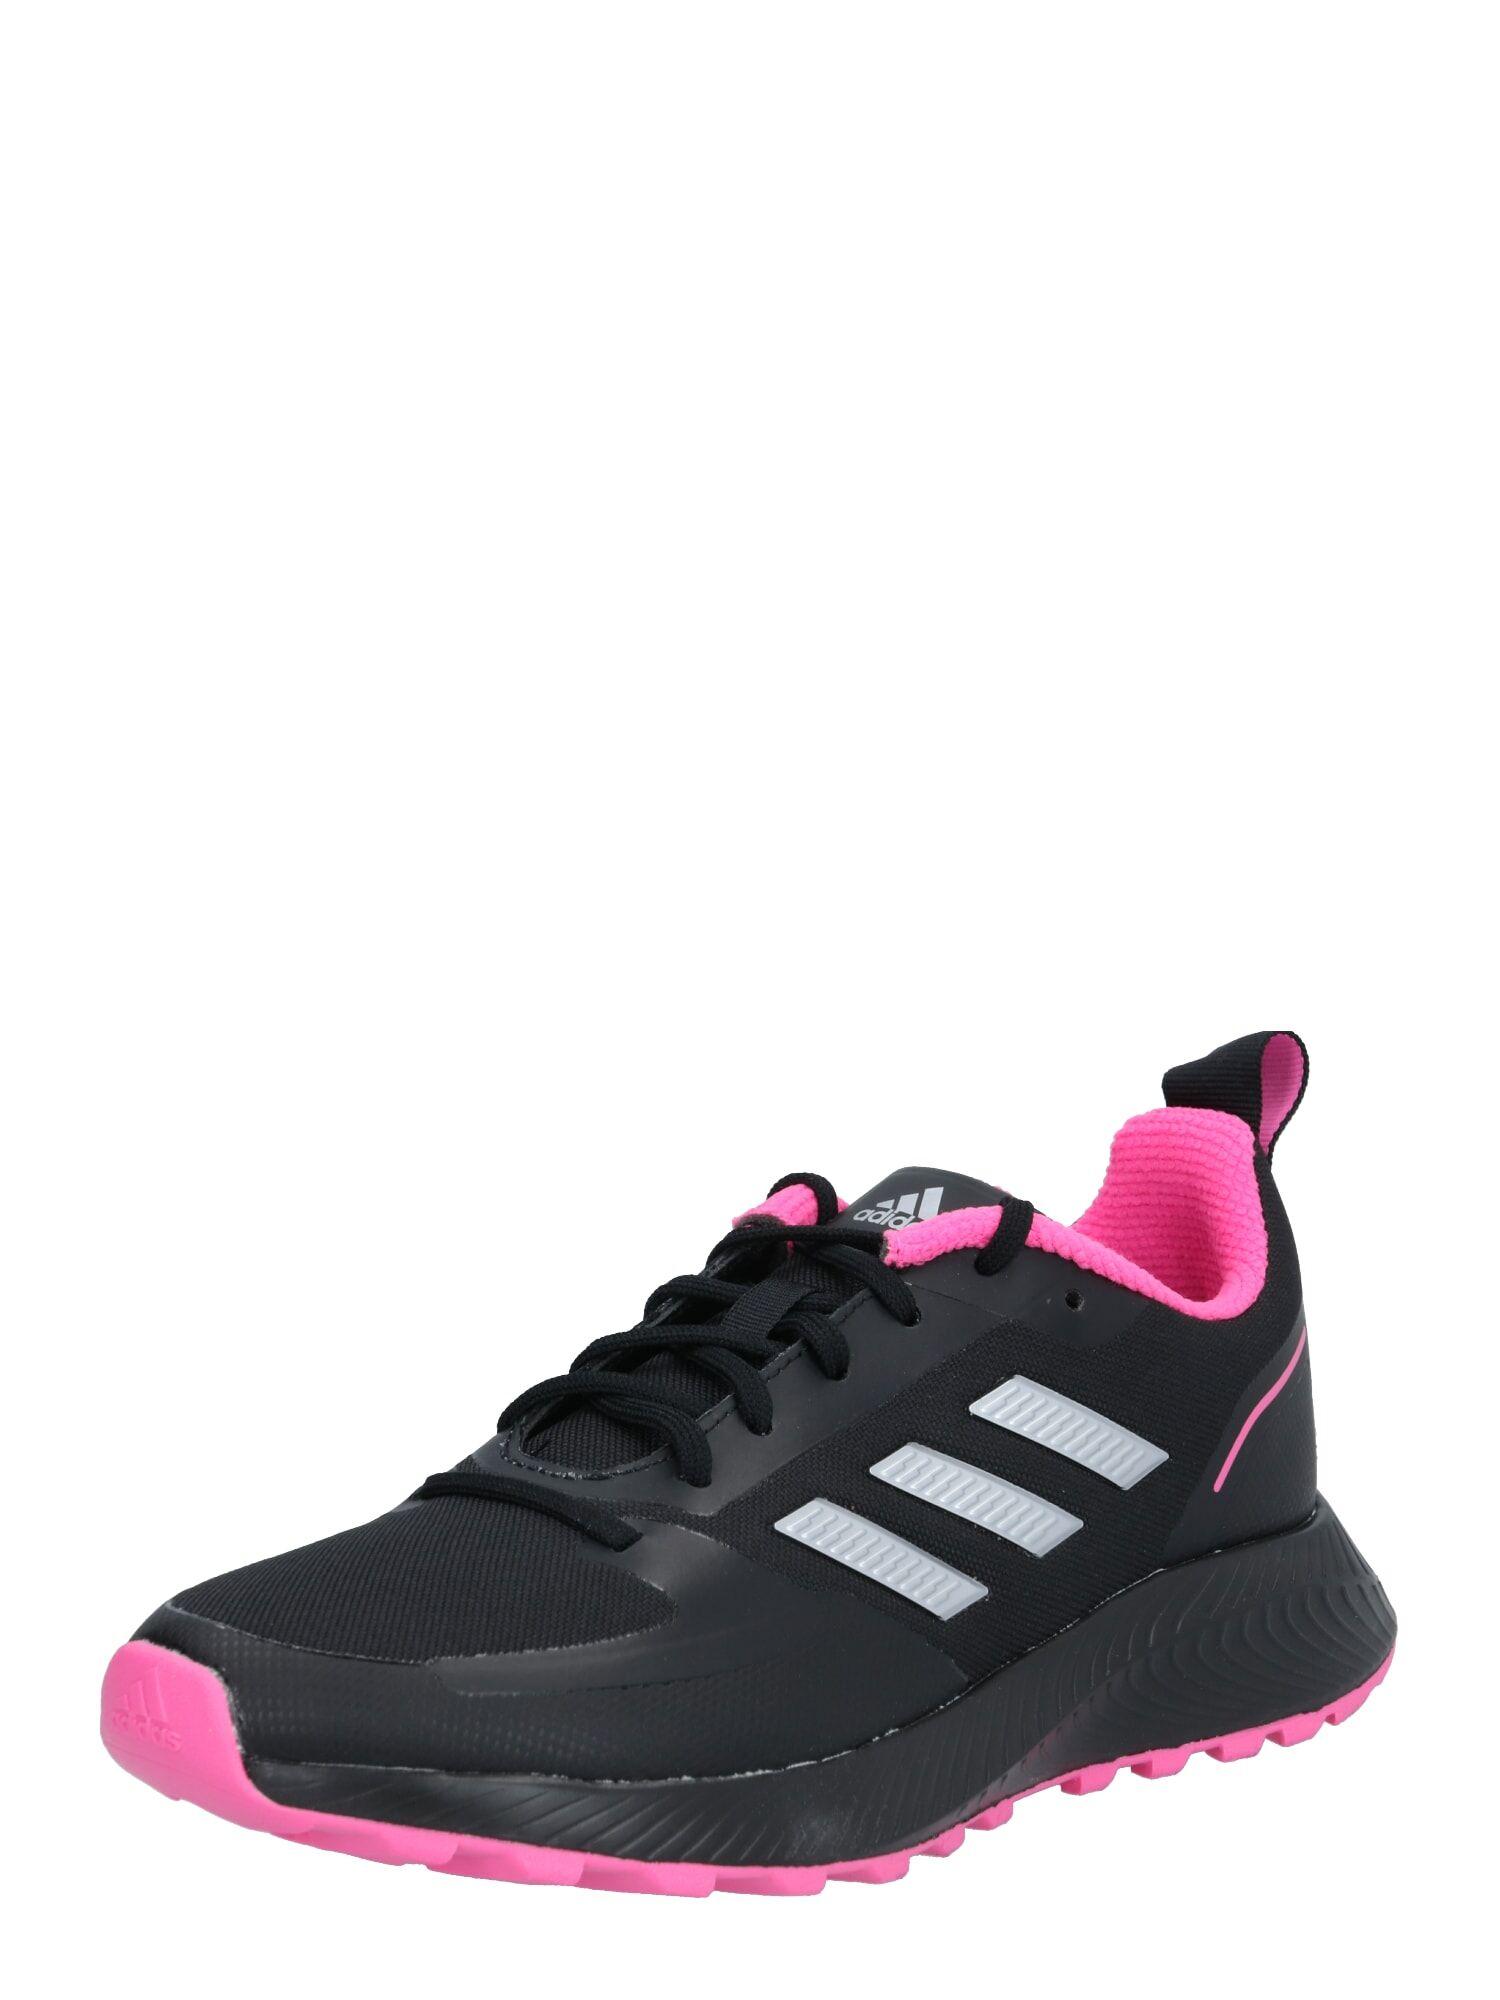 ADIDAS PERFORMANCE Chaussure de course 'Runfalcon 2.0'  - Noir - Taille: 7.5 - female